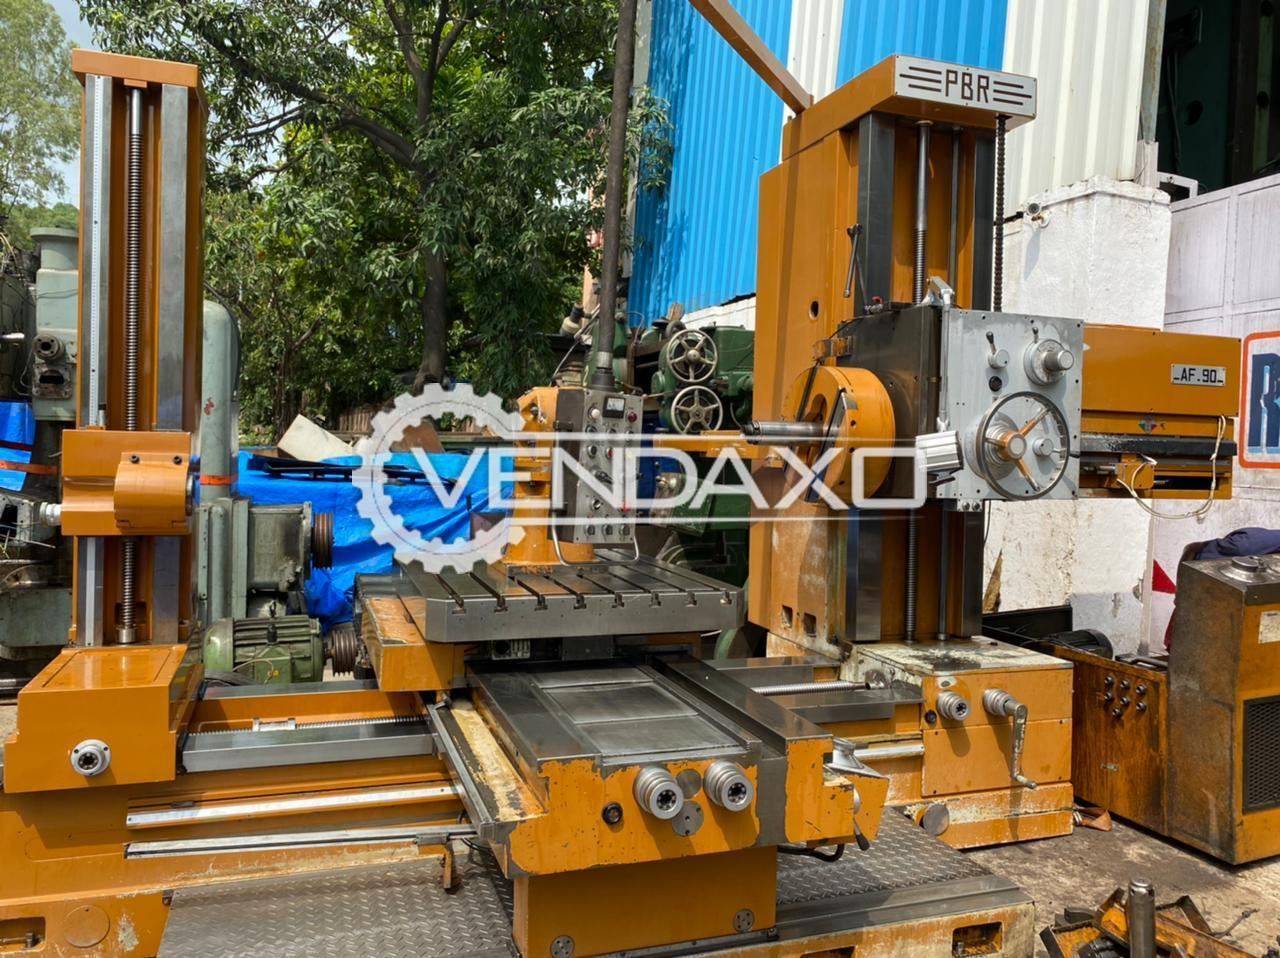 PBR AFU 90 Boring Machine - Spindle Size - 90 mm